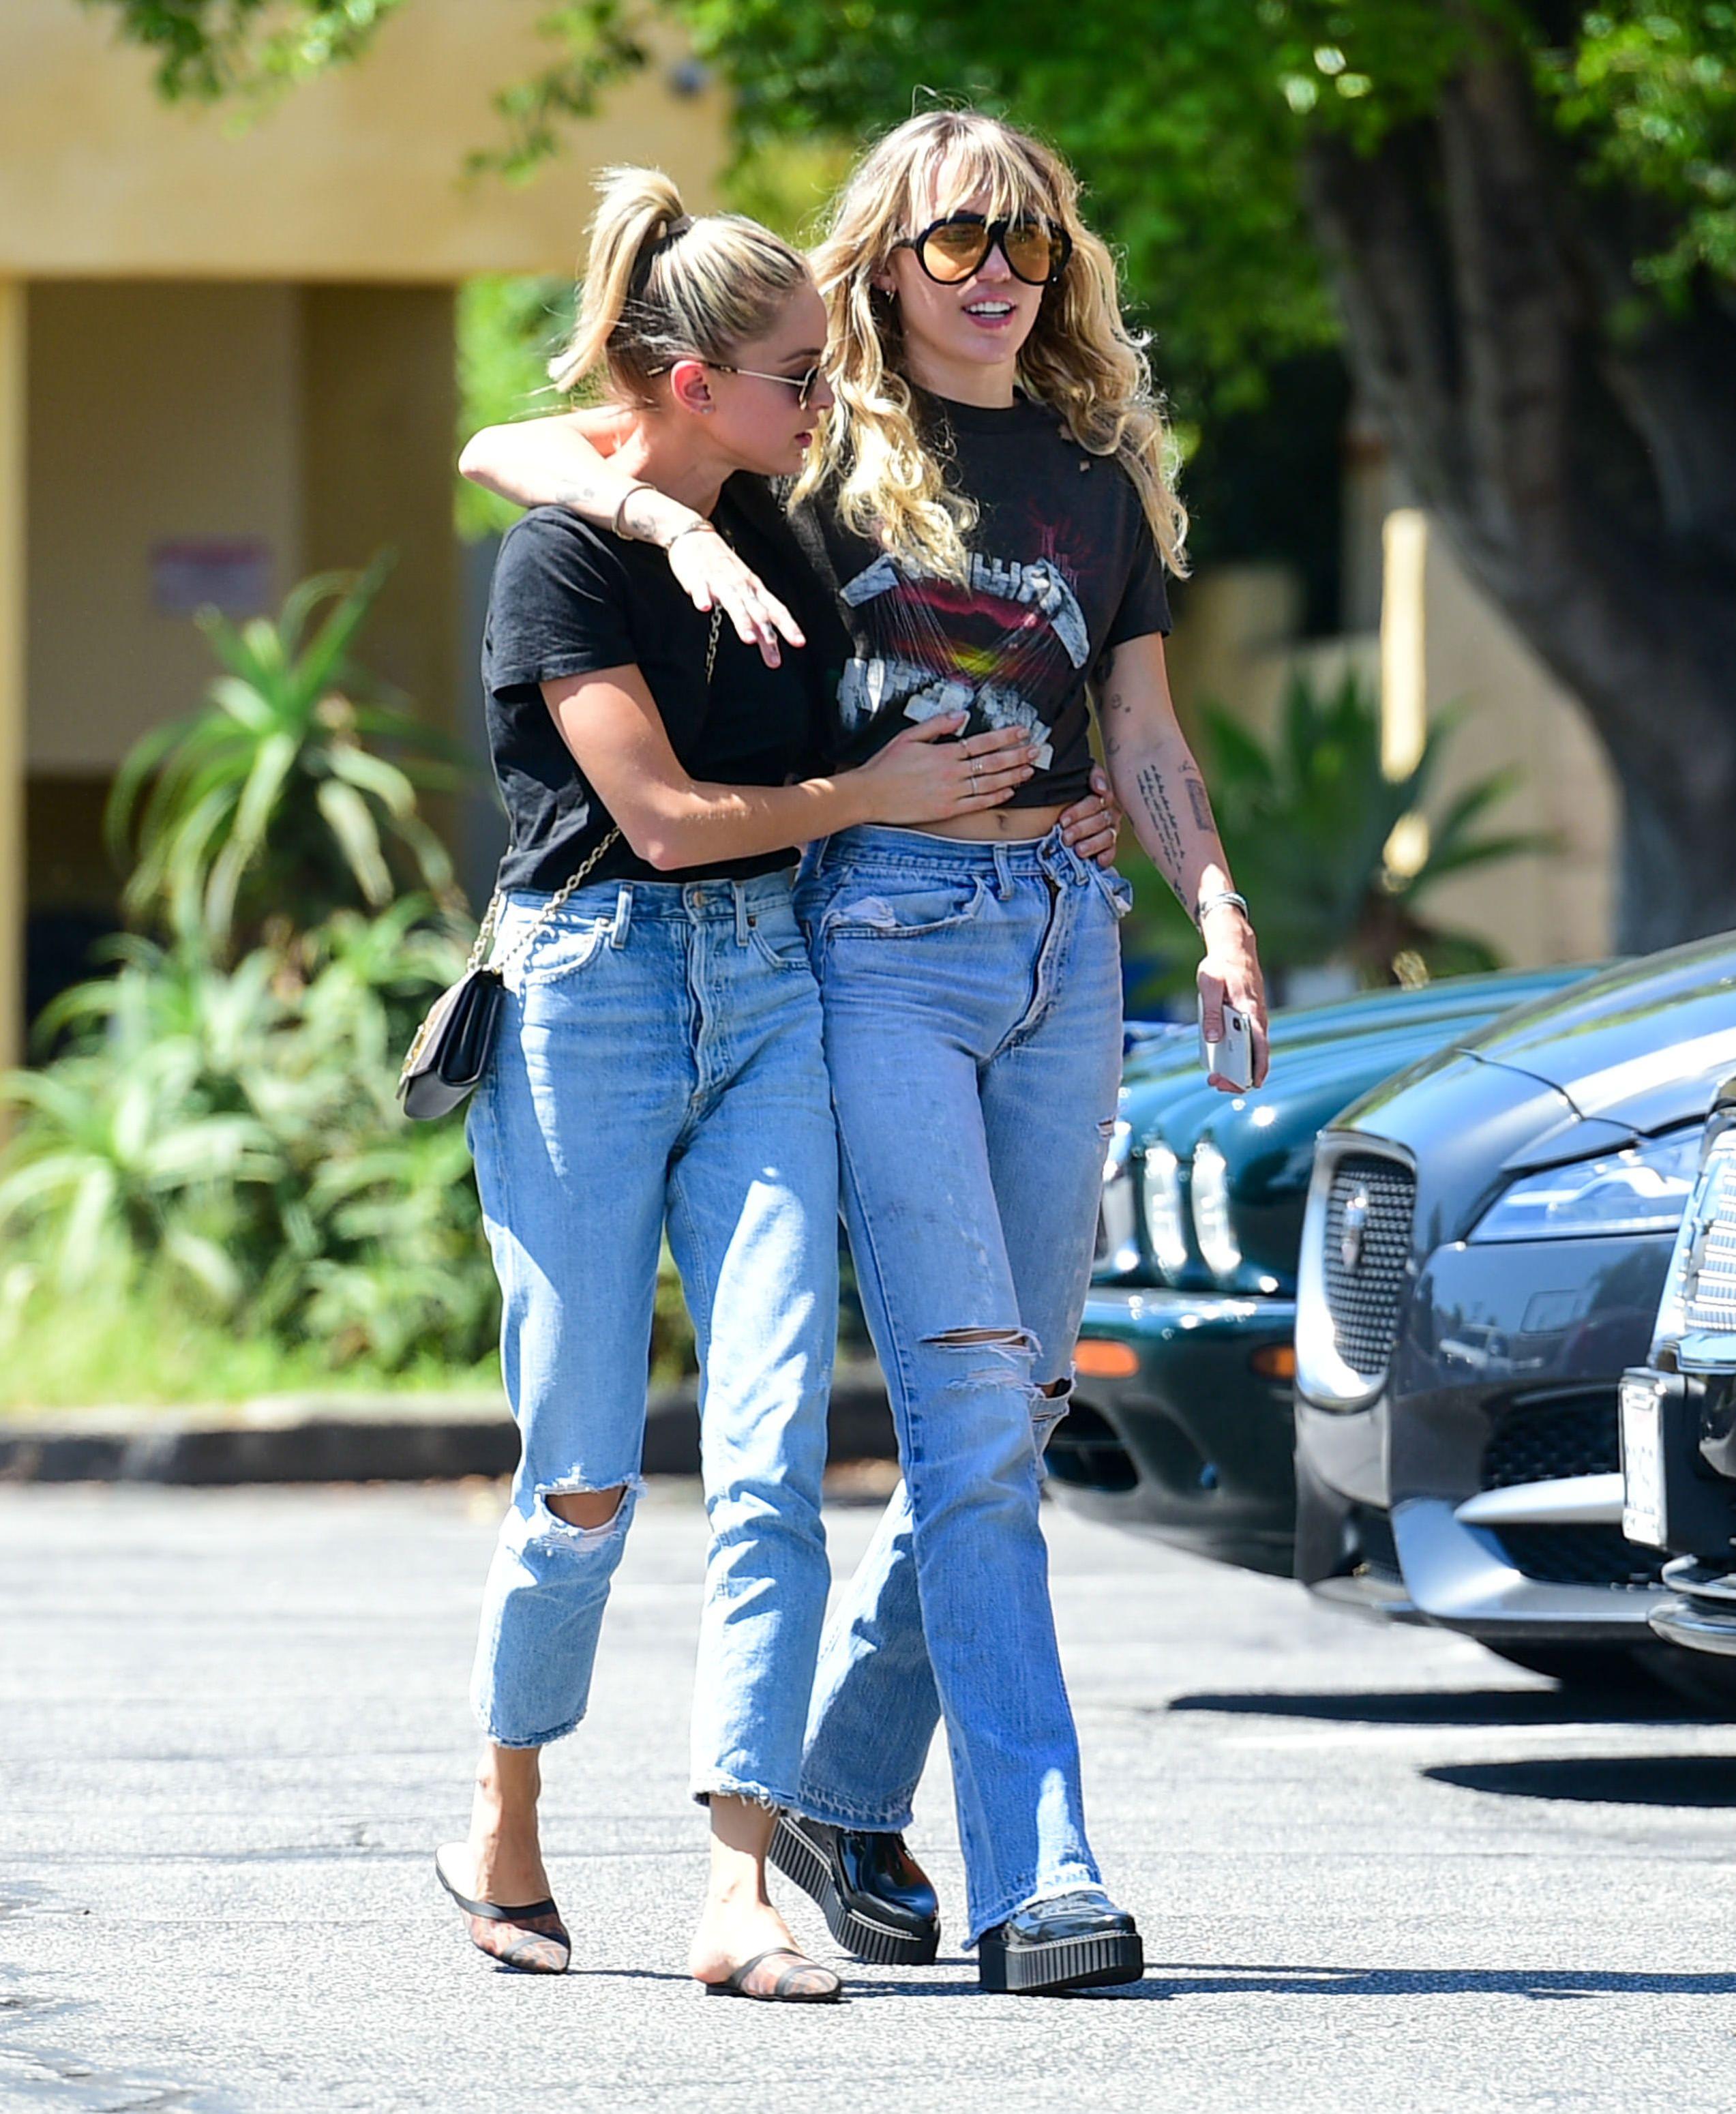 Why Miley Cyrus and Kaitlynn Carter Split